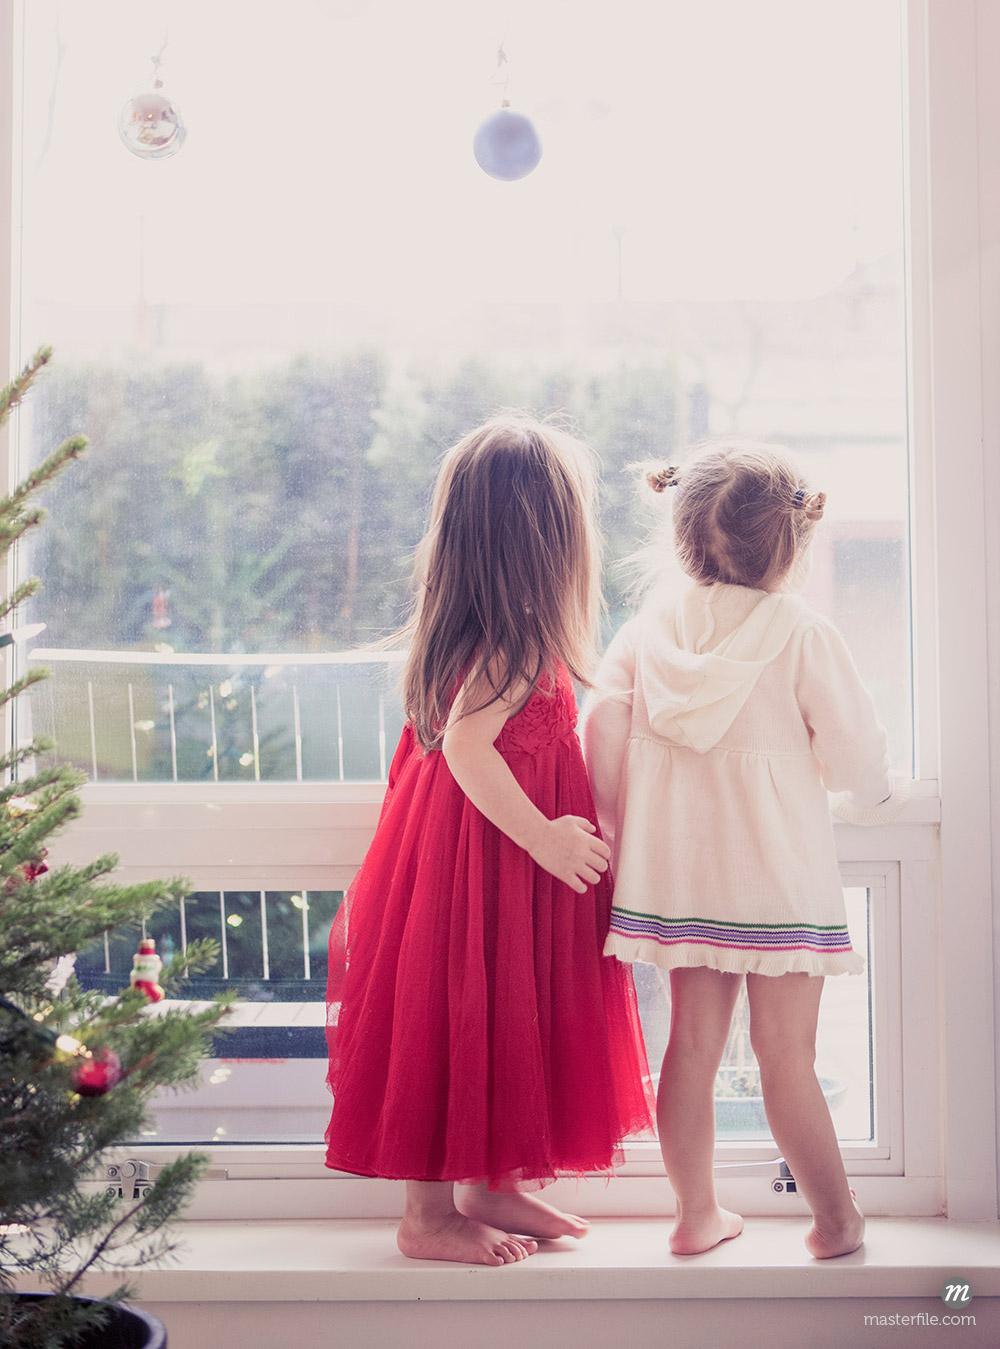 Girls on window ledge below Christmas ornaments © Masterfile